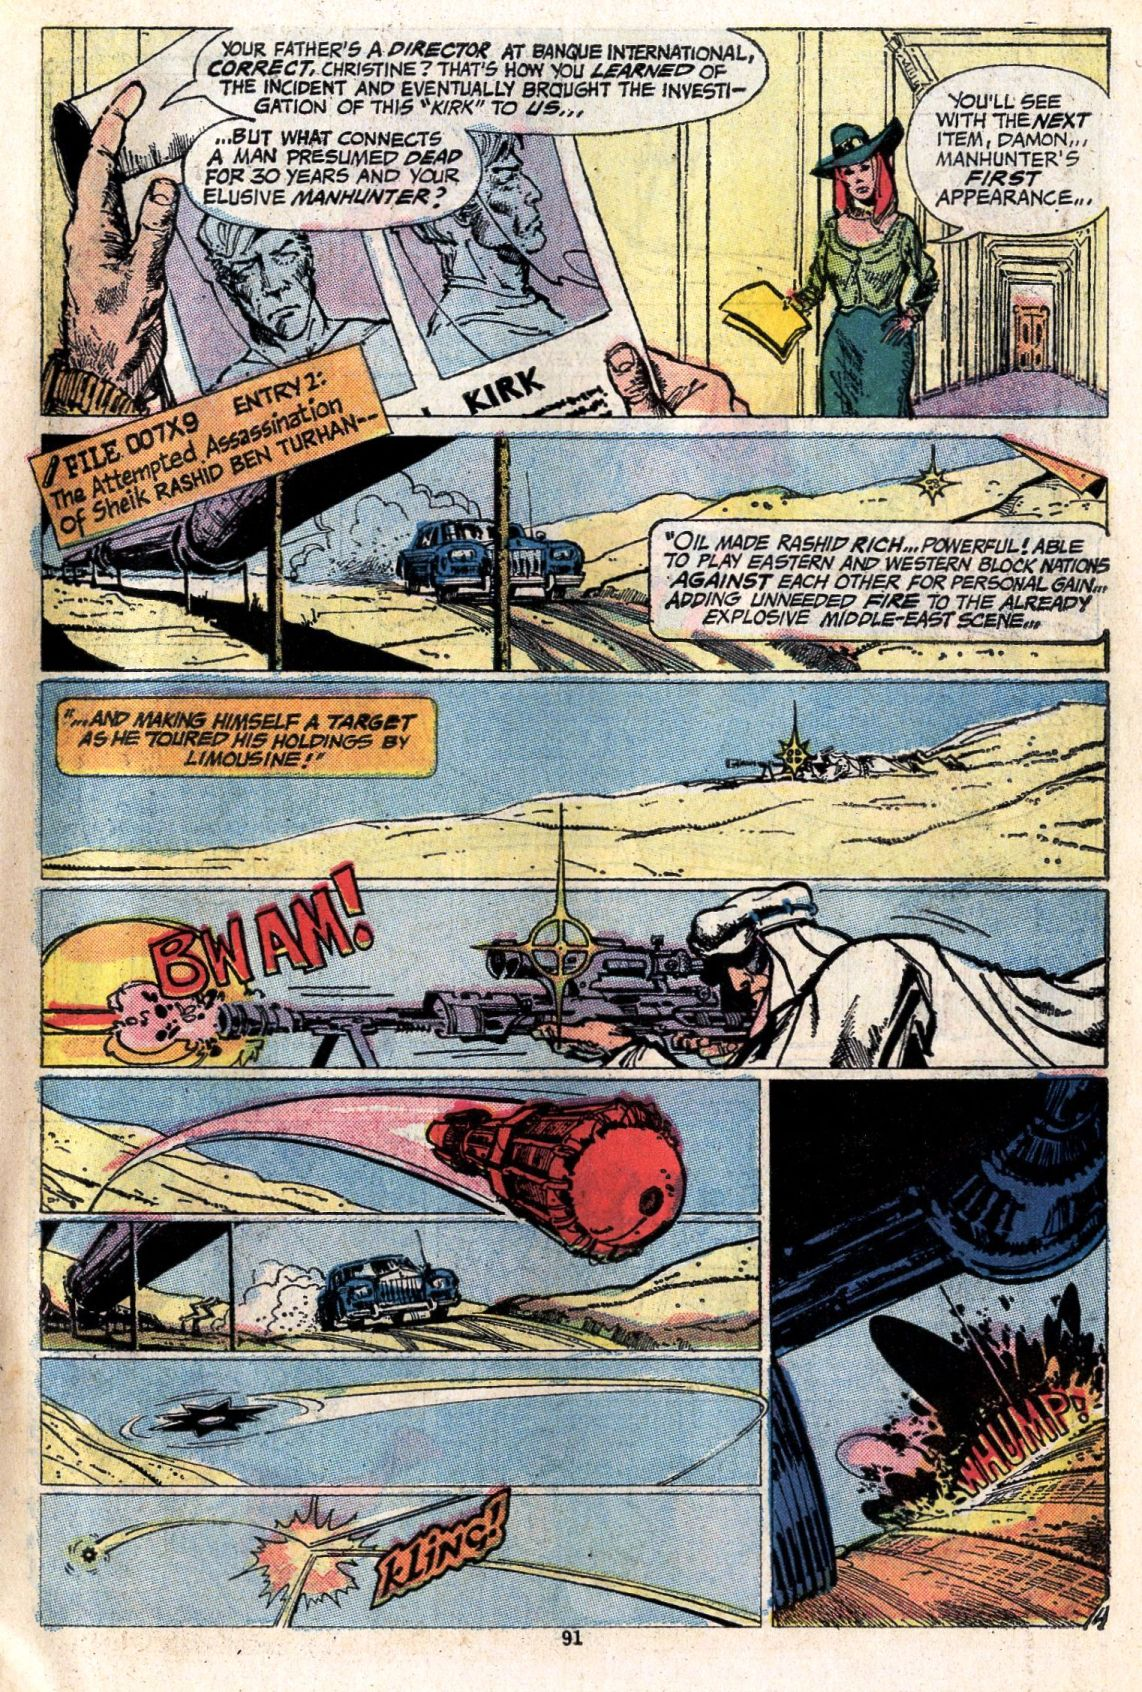 Detective Comics (1937) 438 Page 91